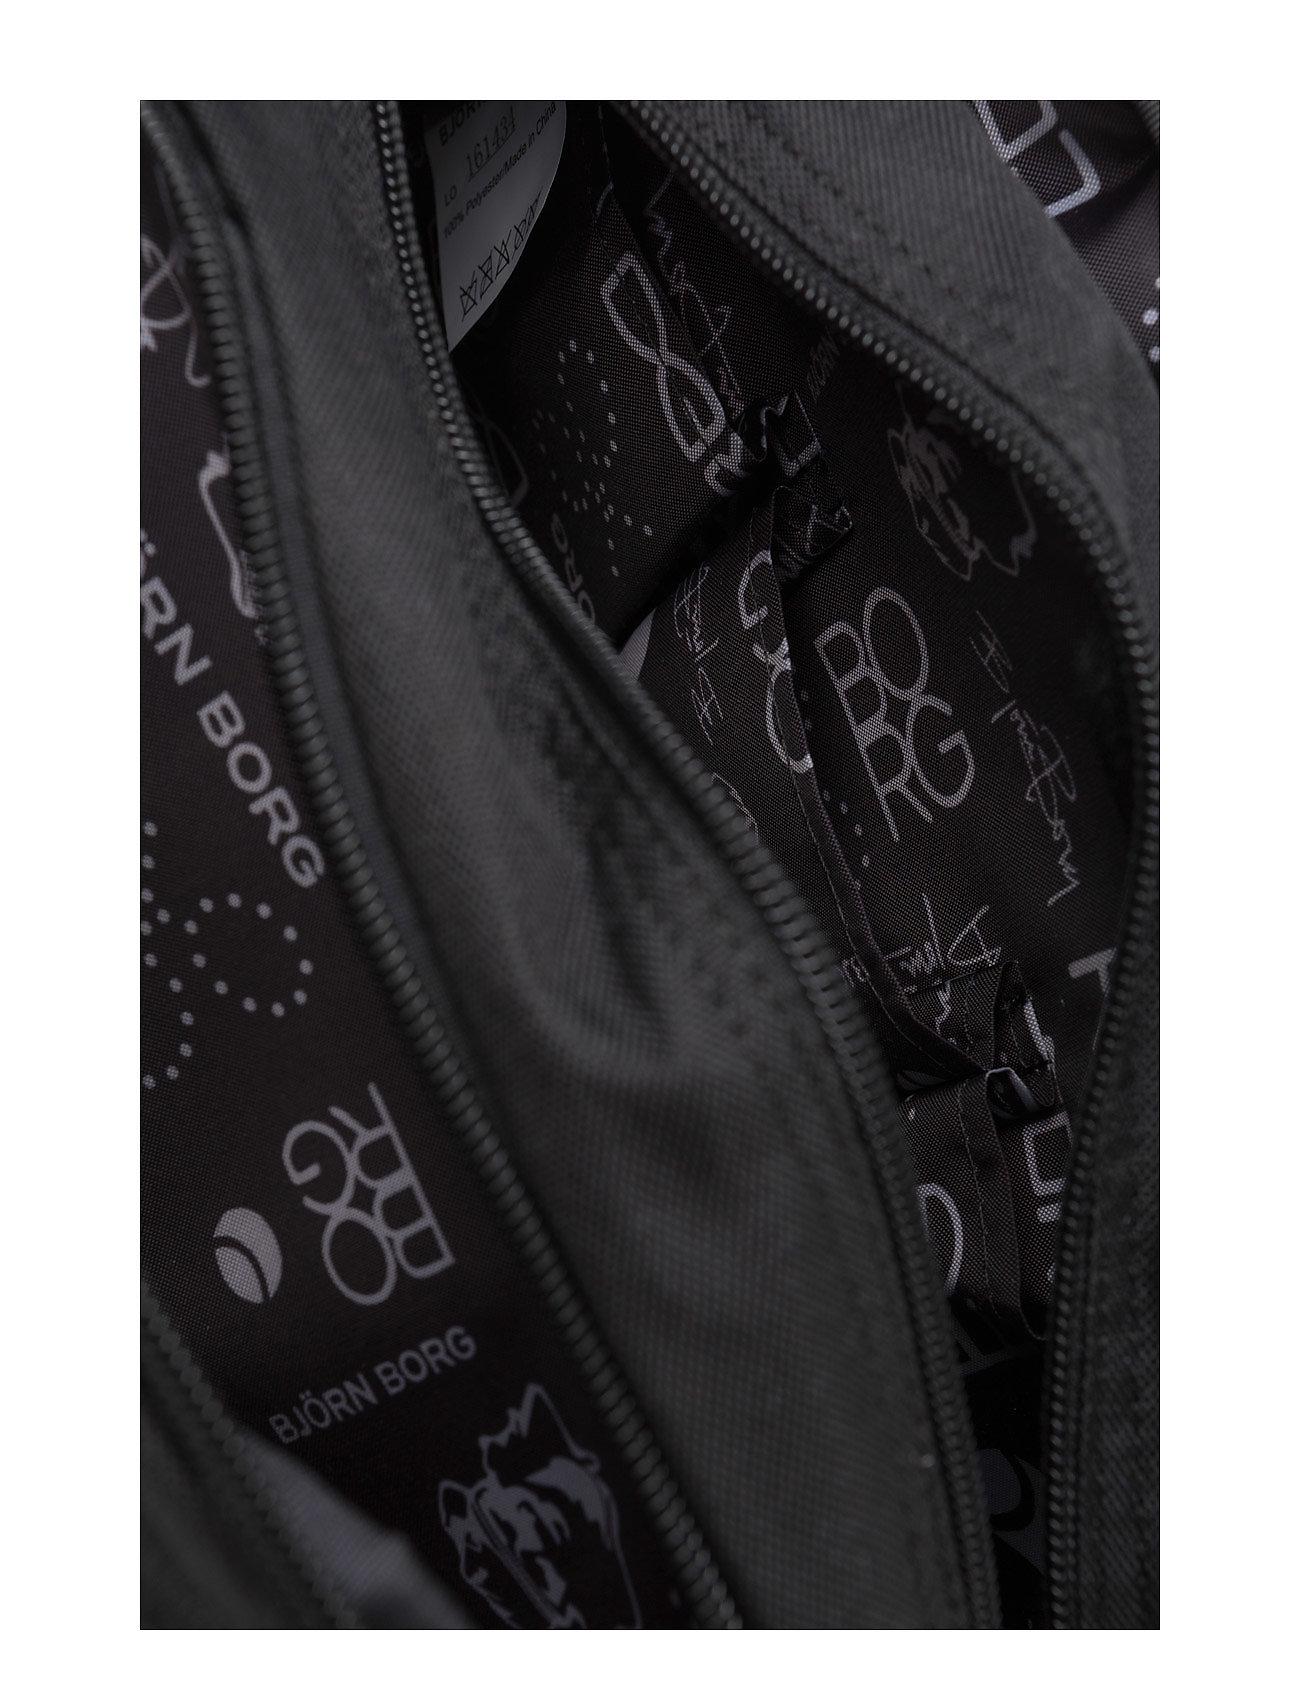 Borg CoreblackBjörn Bags Bags CoreblackBjörn Borg CoreblackBjörn lK1JFTc